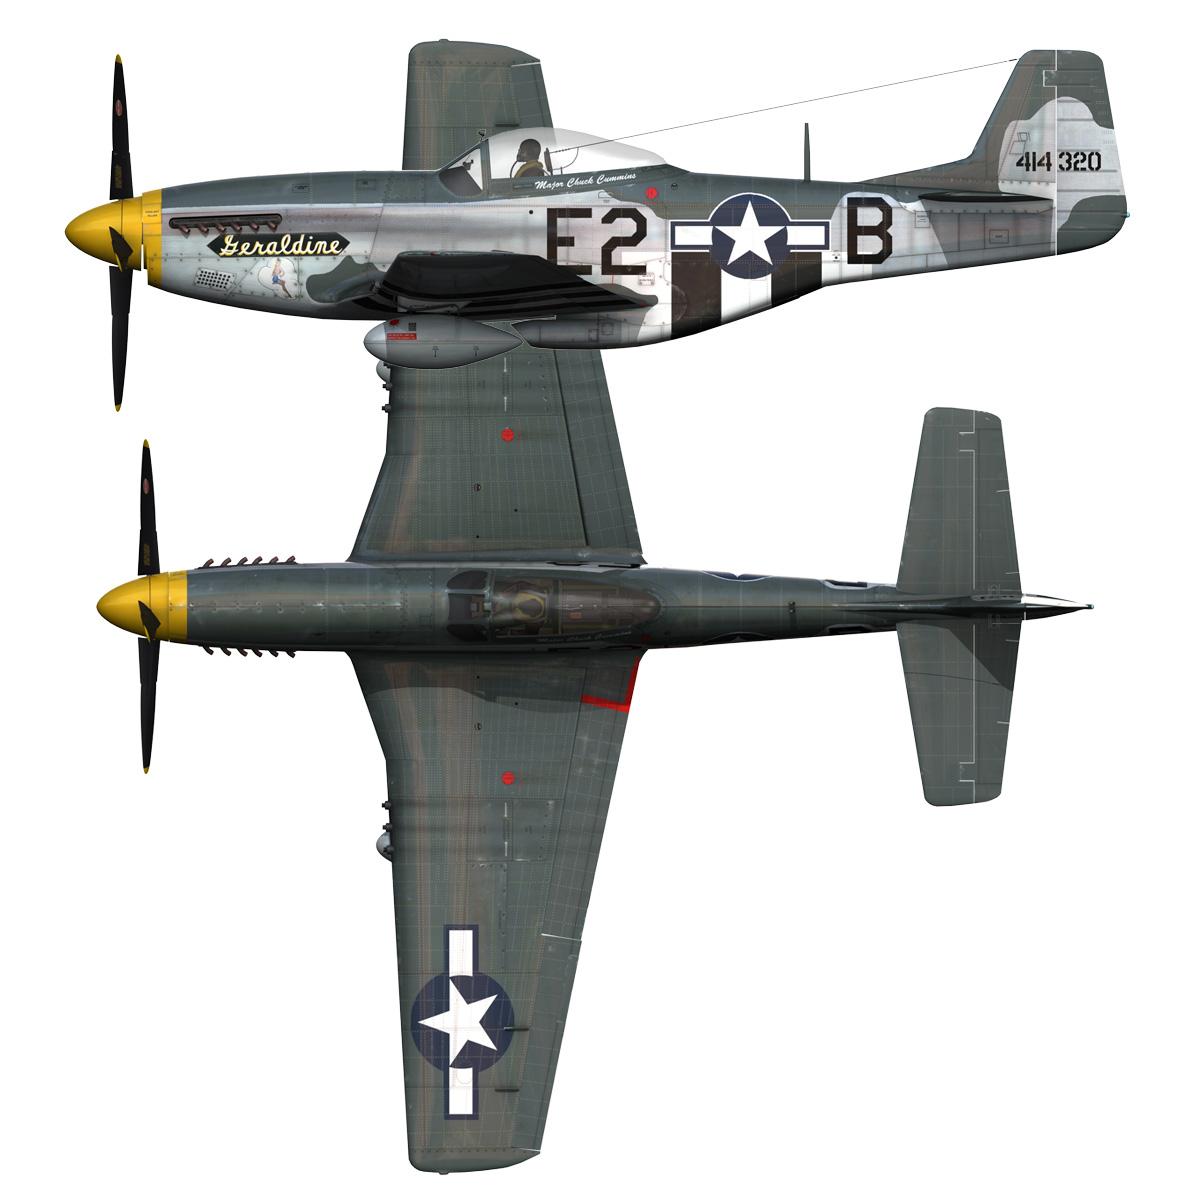 North American P-51D - Geraldine 3d model fbx c4d lwo obj 265953